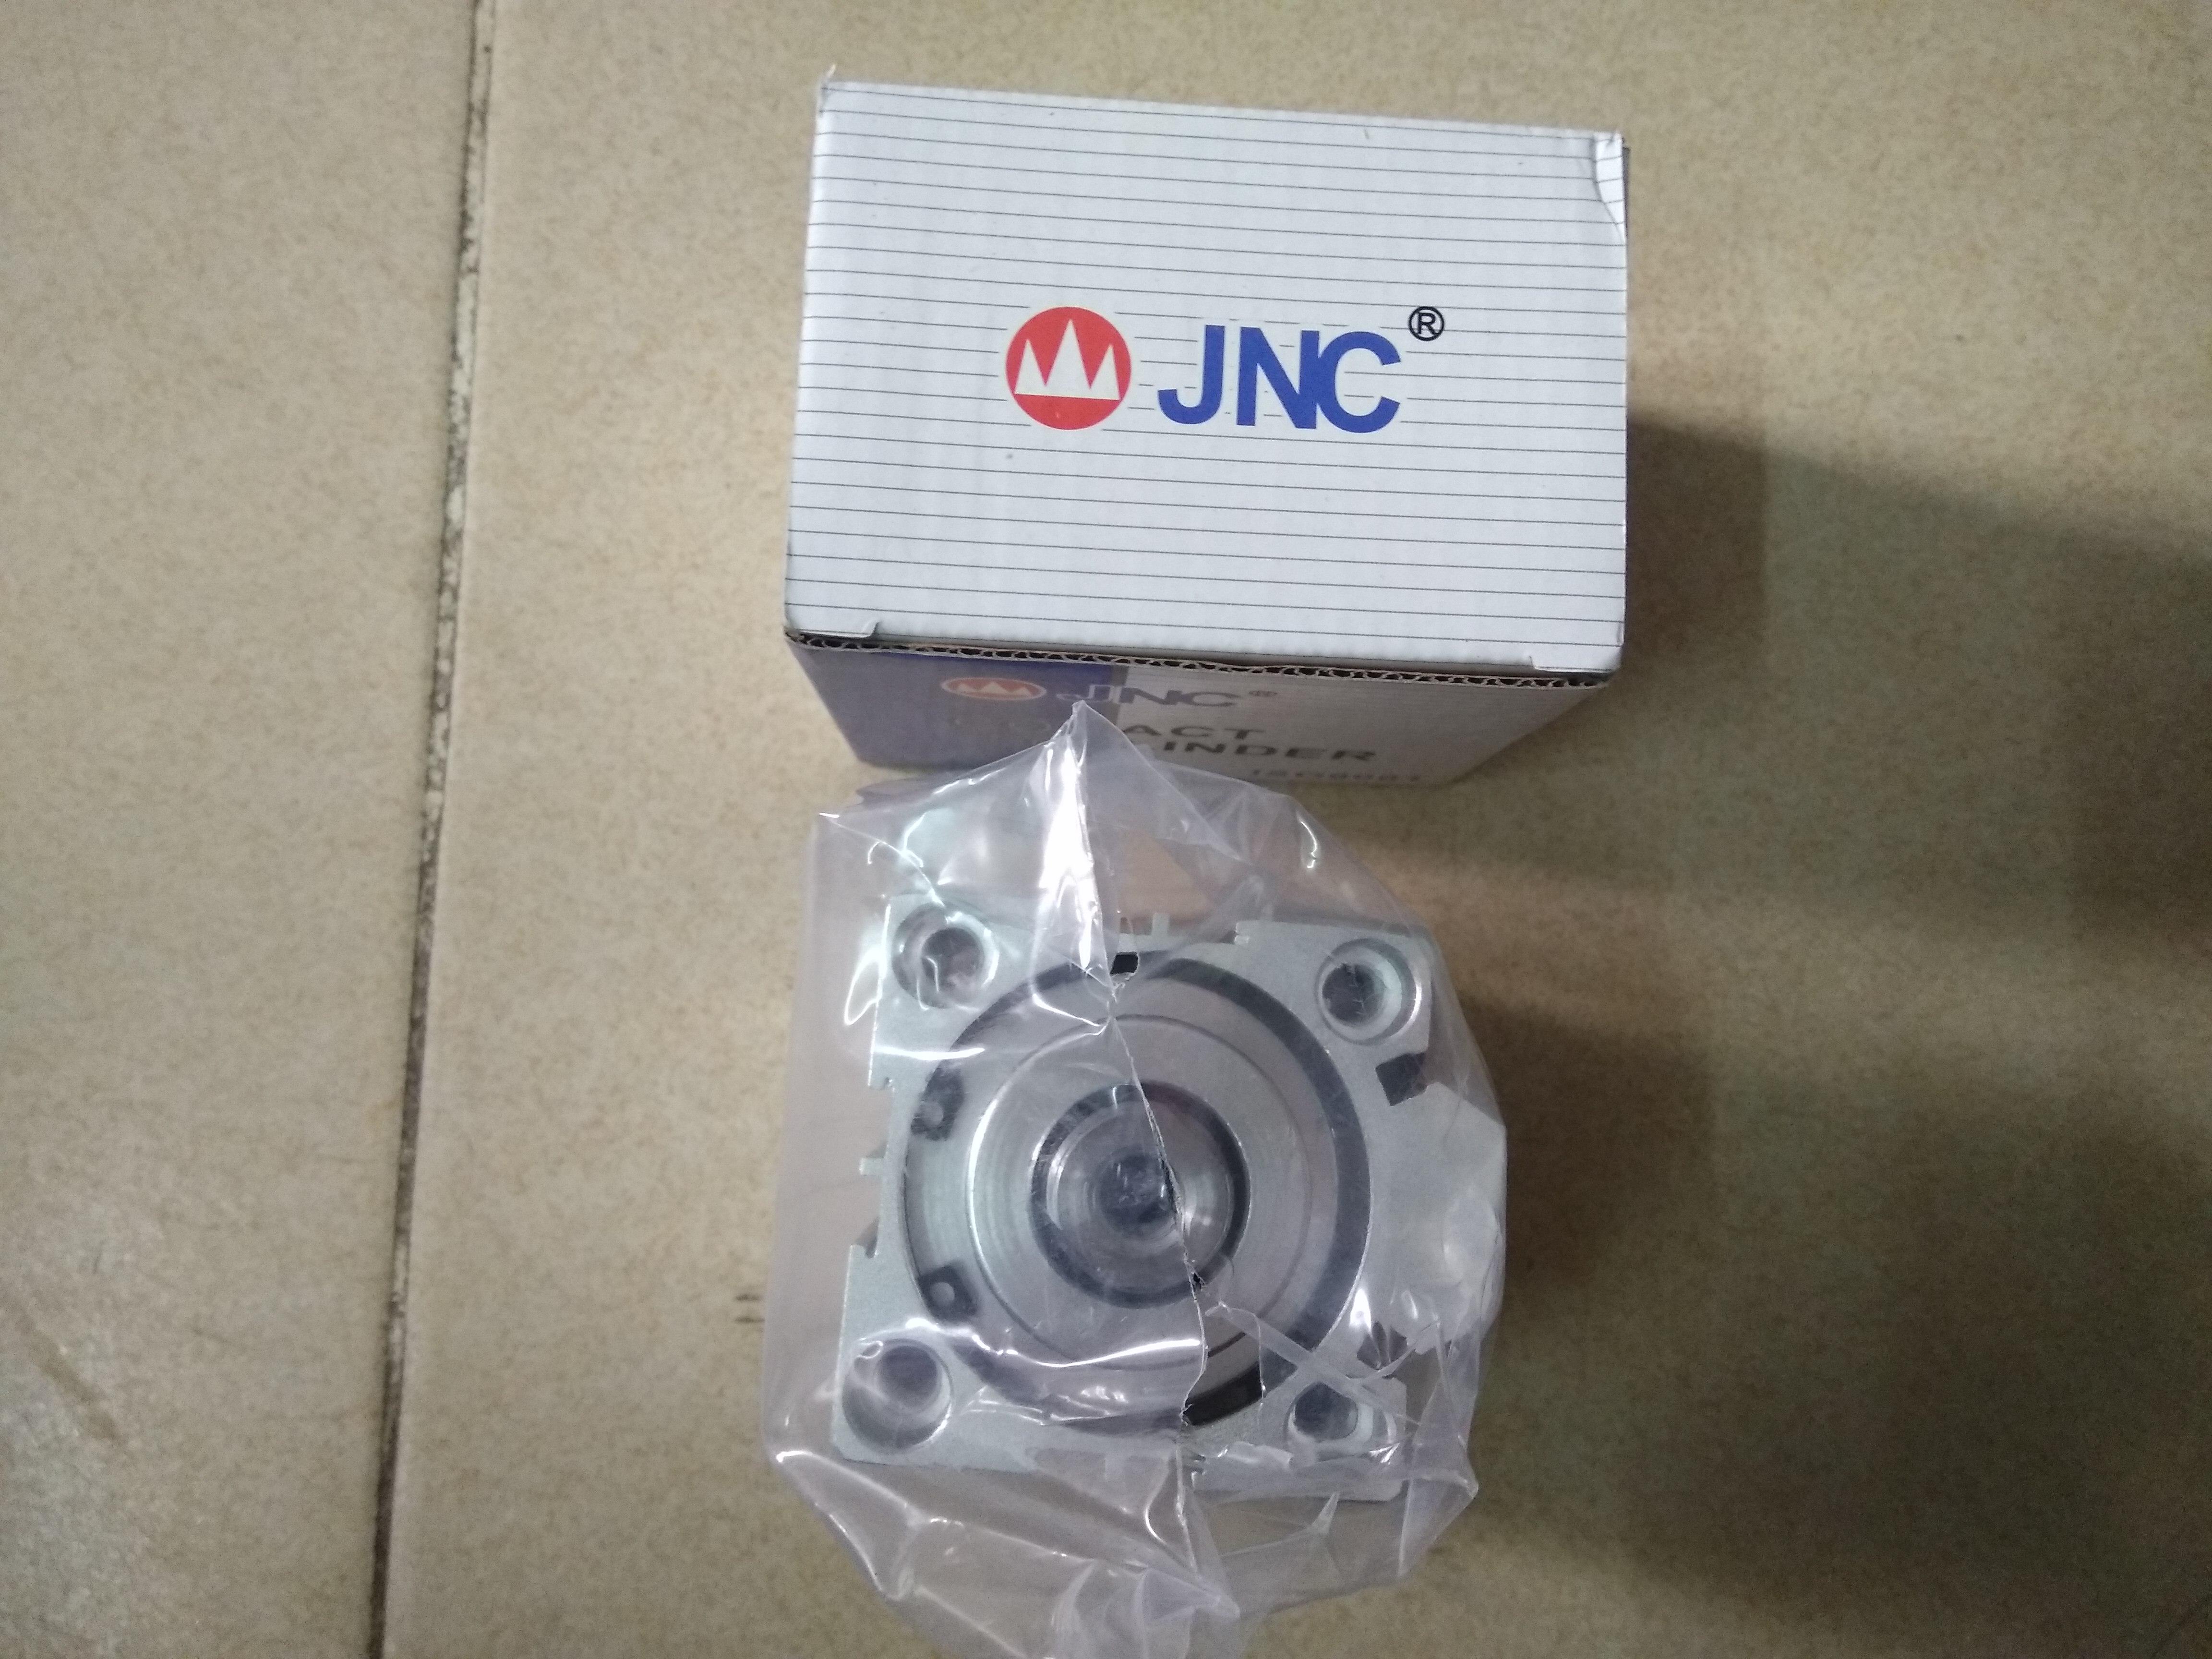 JNC cylindre compact SDA50 * * * * 85SDA50 90SDA50 95SDA50 100